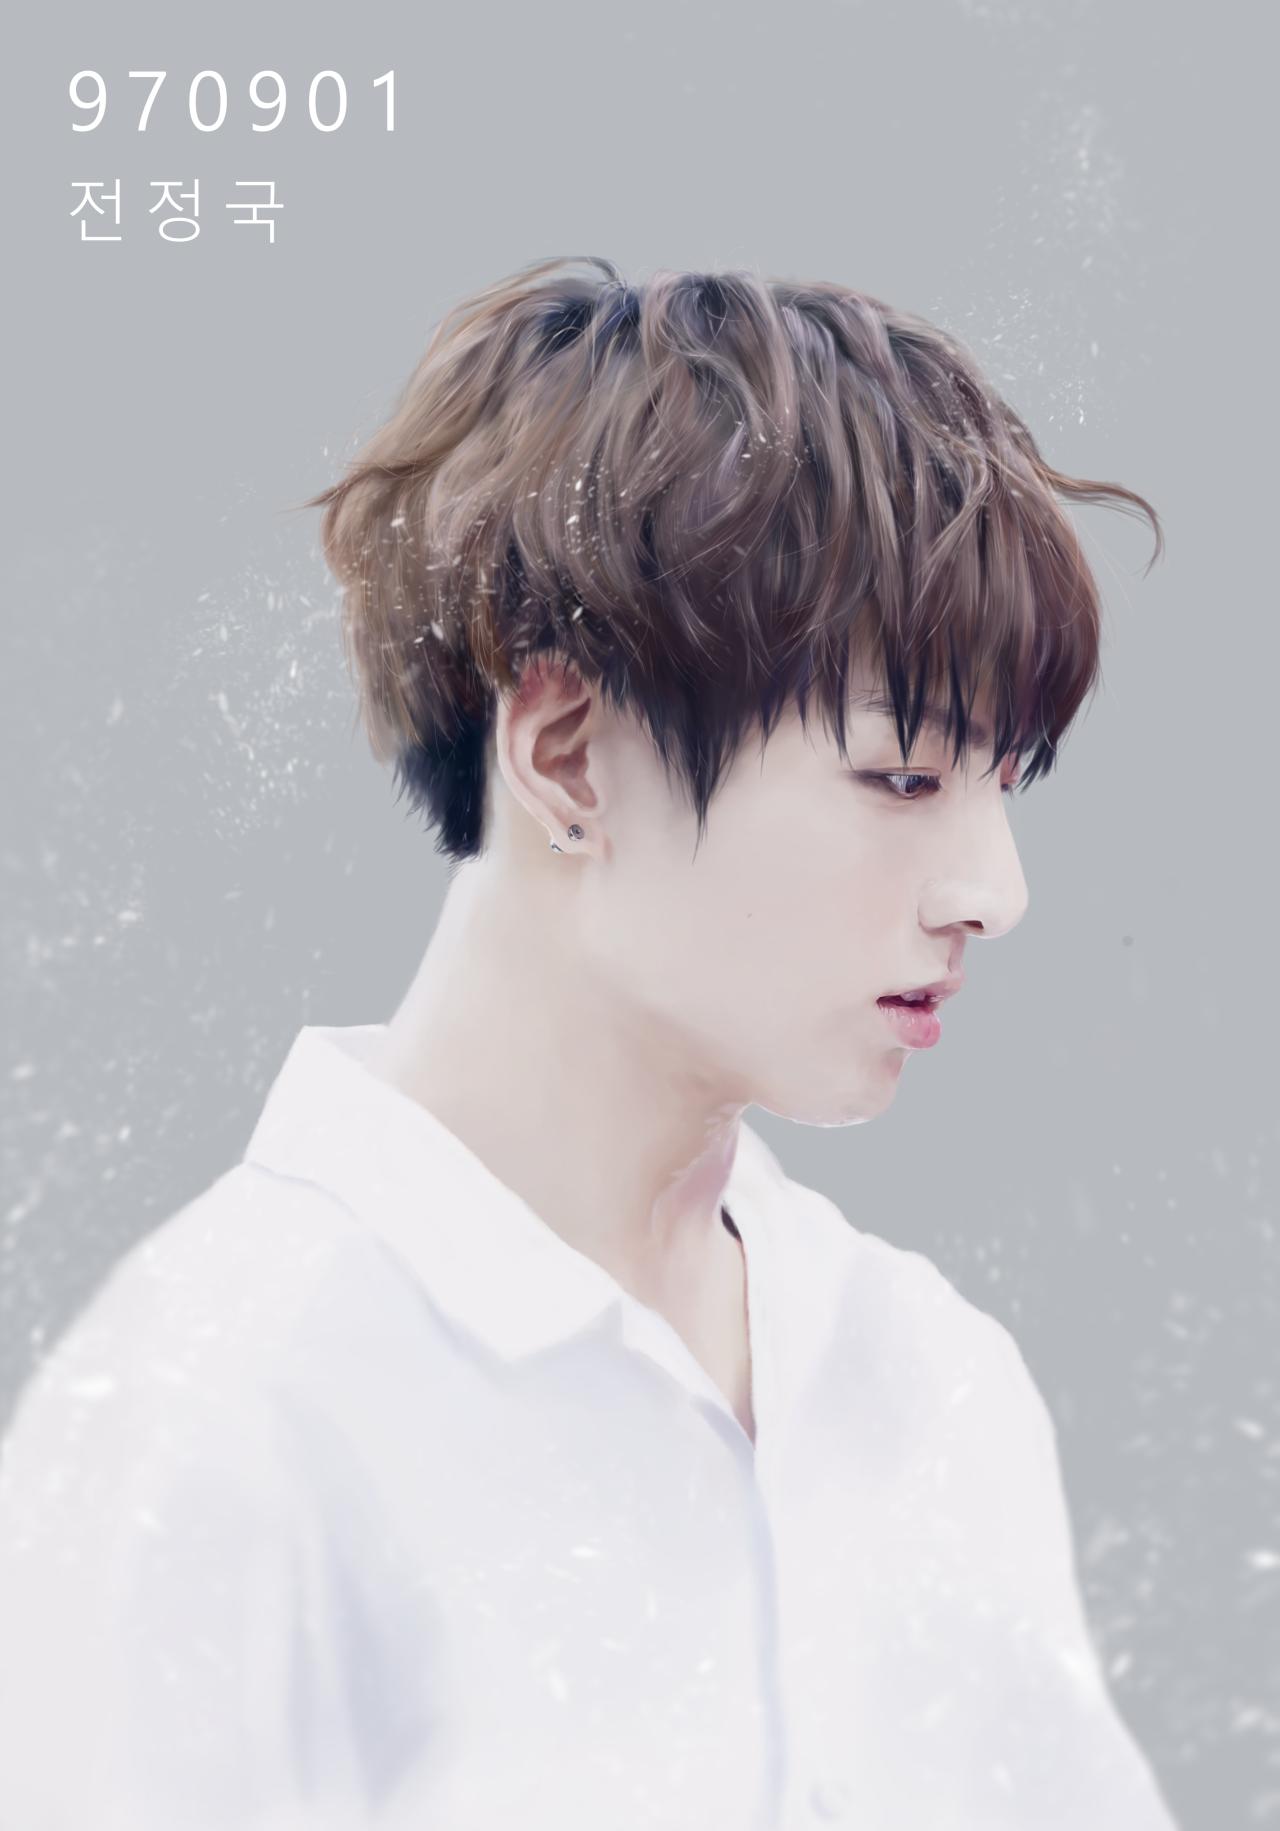 Jungkook Jeon Jungkook BTS Pinterest BTS, Kpop and